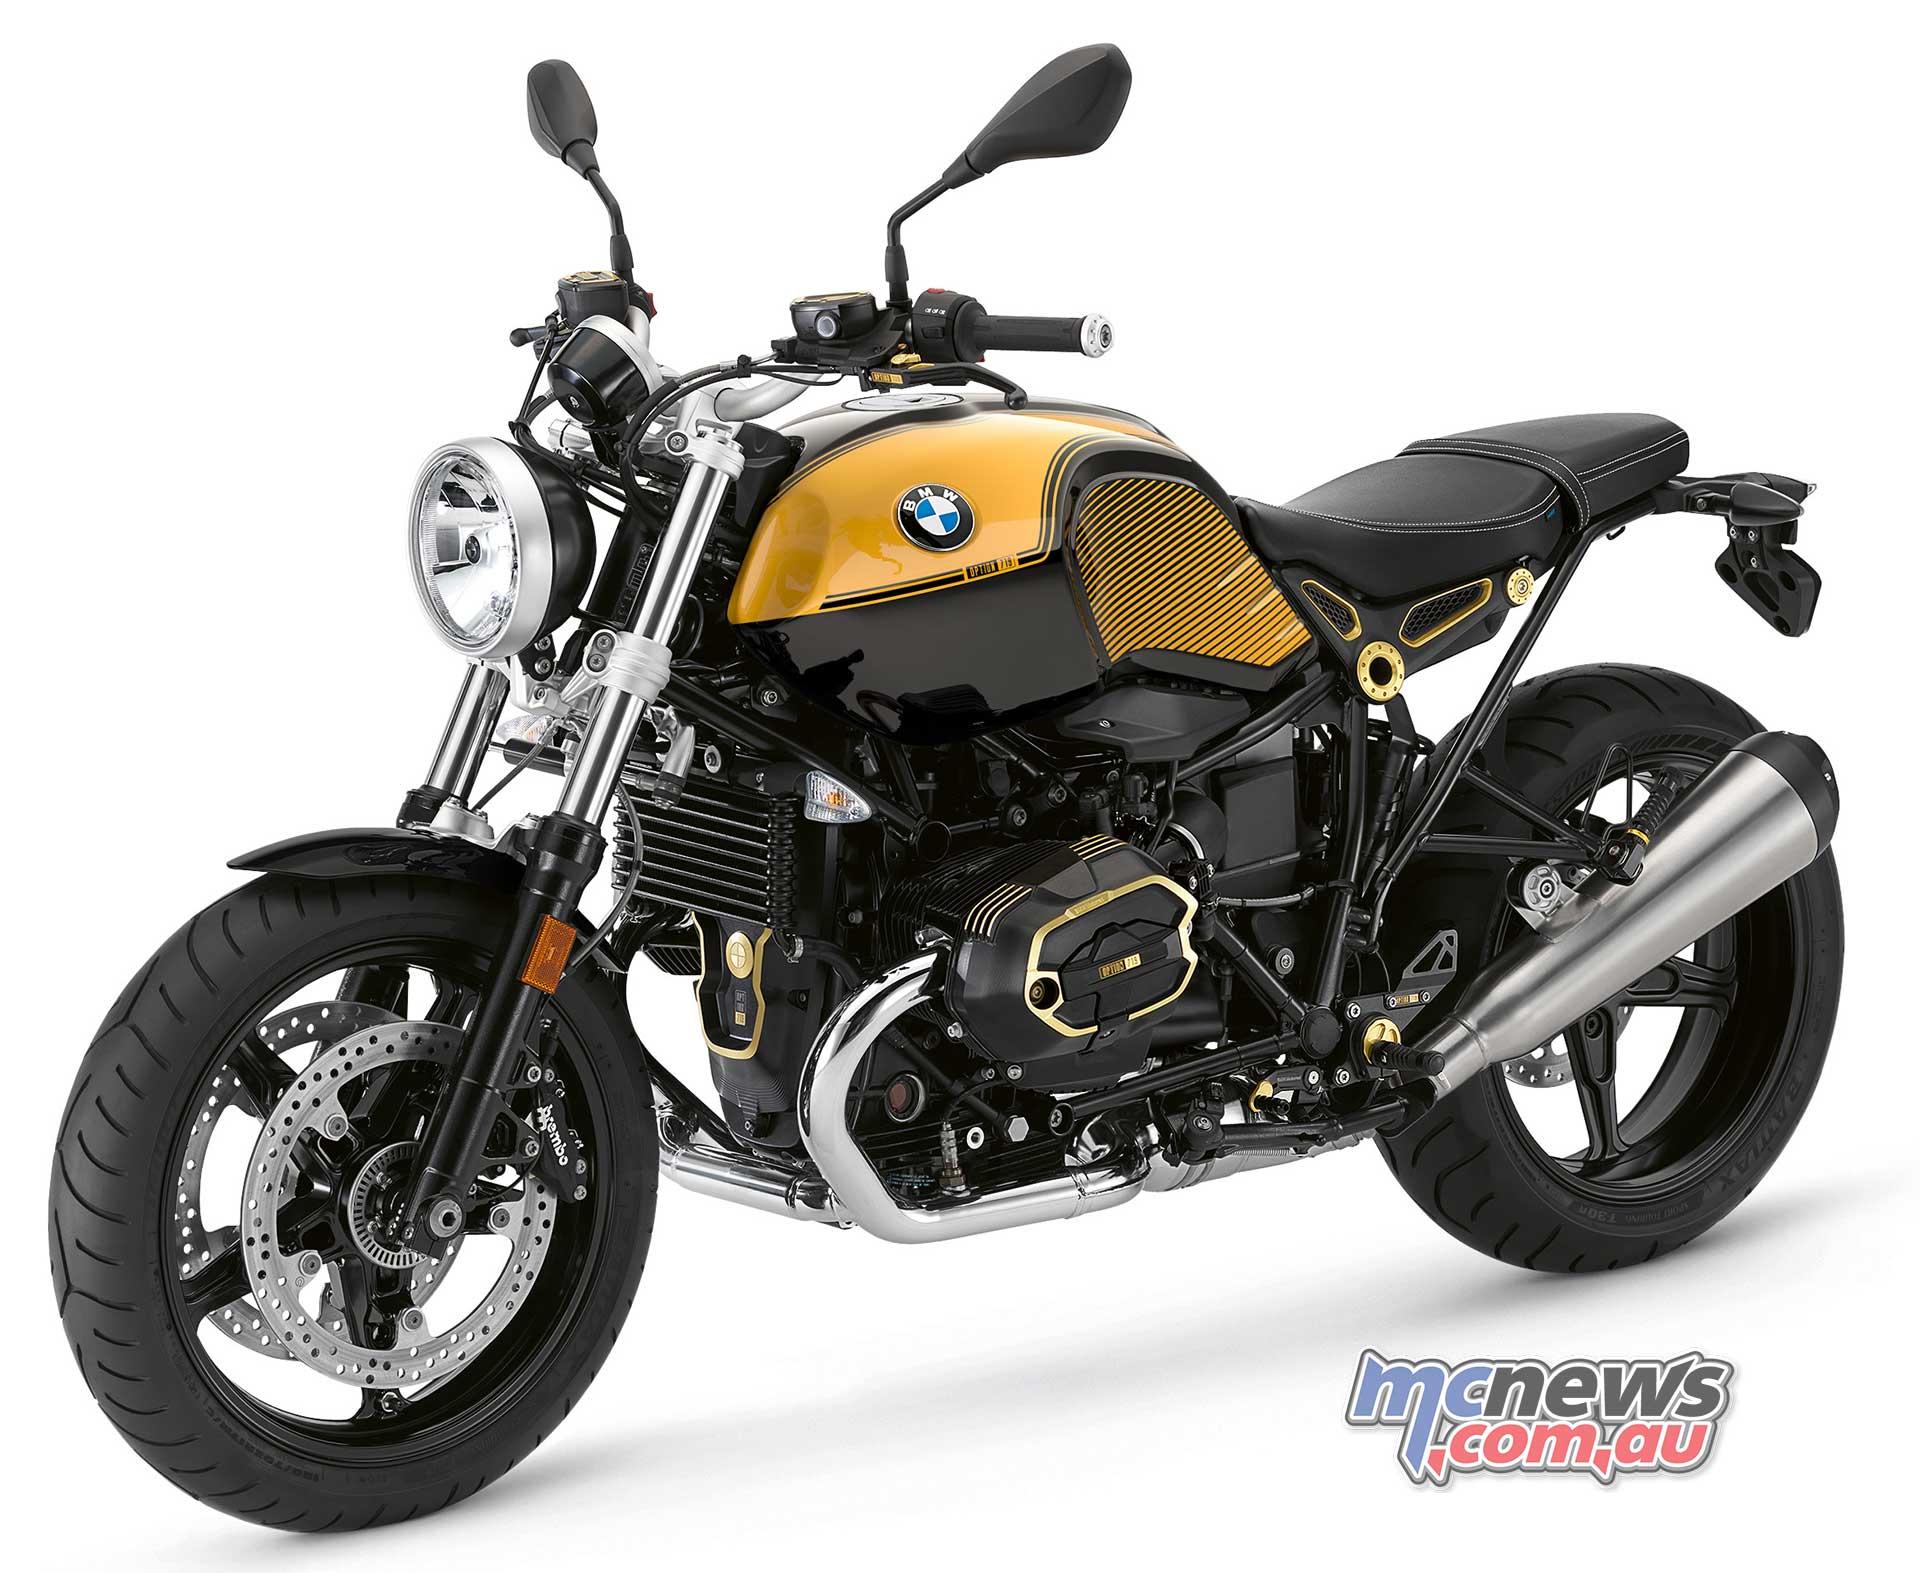 Bmw Nine T Pure >> 2019 BMW R nineT model line-up and changes | MCNews.com.au